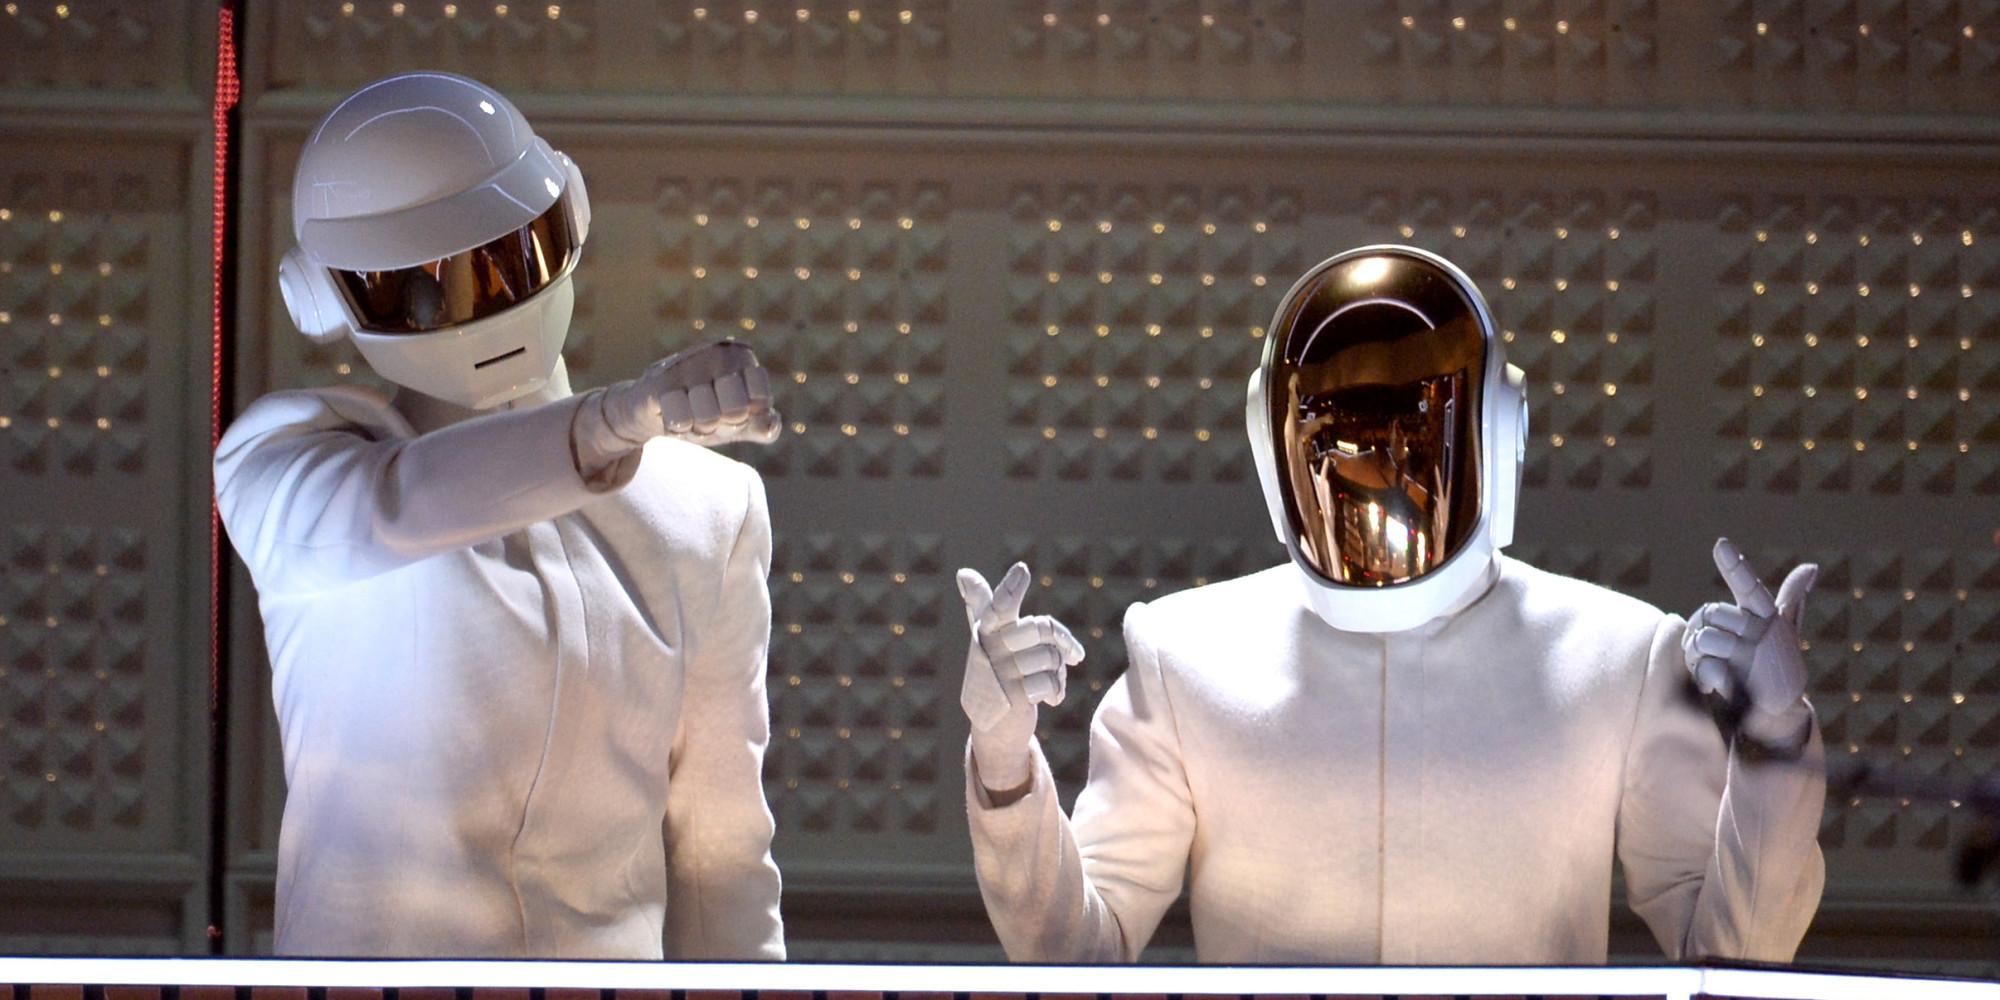 Daft Punk to Score Dario Argento's New Movie